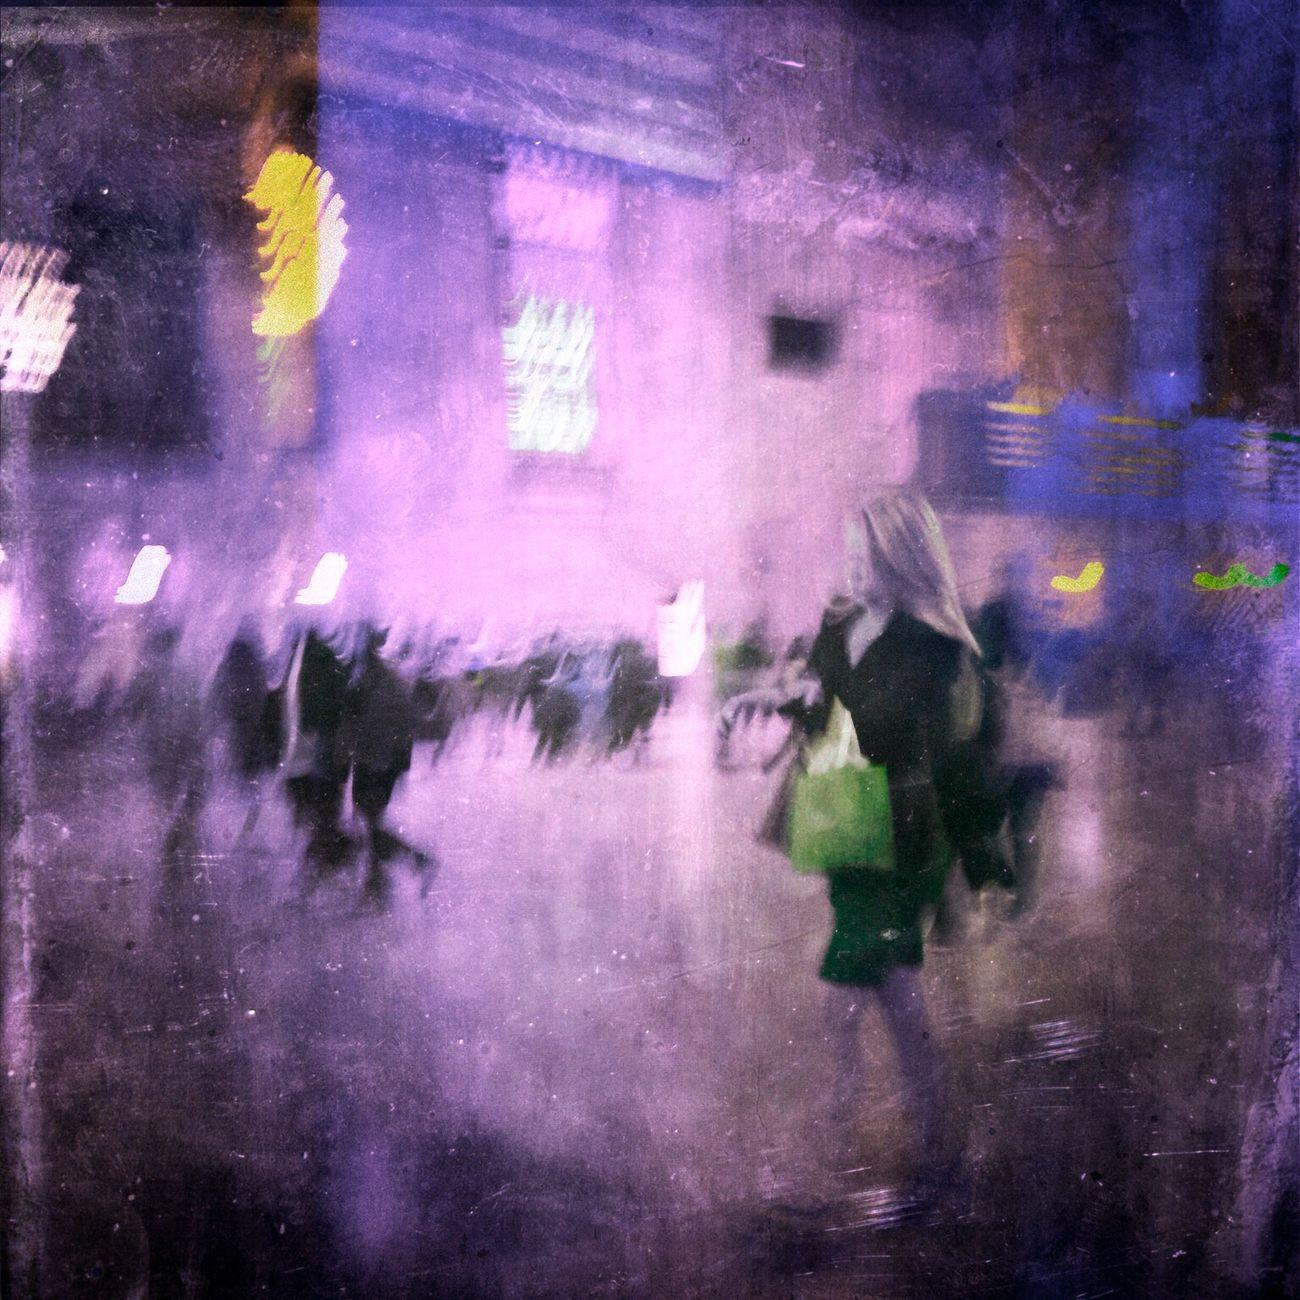 EyeEm Best Edits AMPt_community NEMstreet Mob Fiction